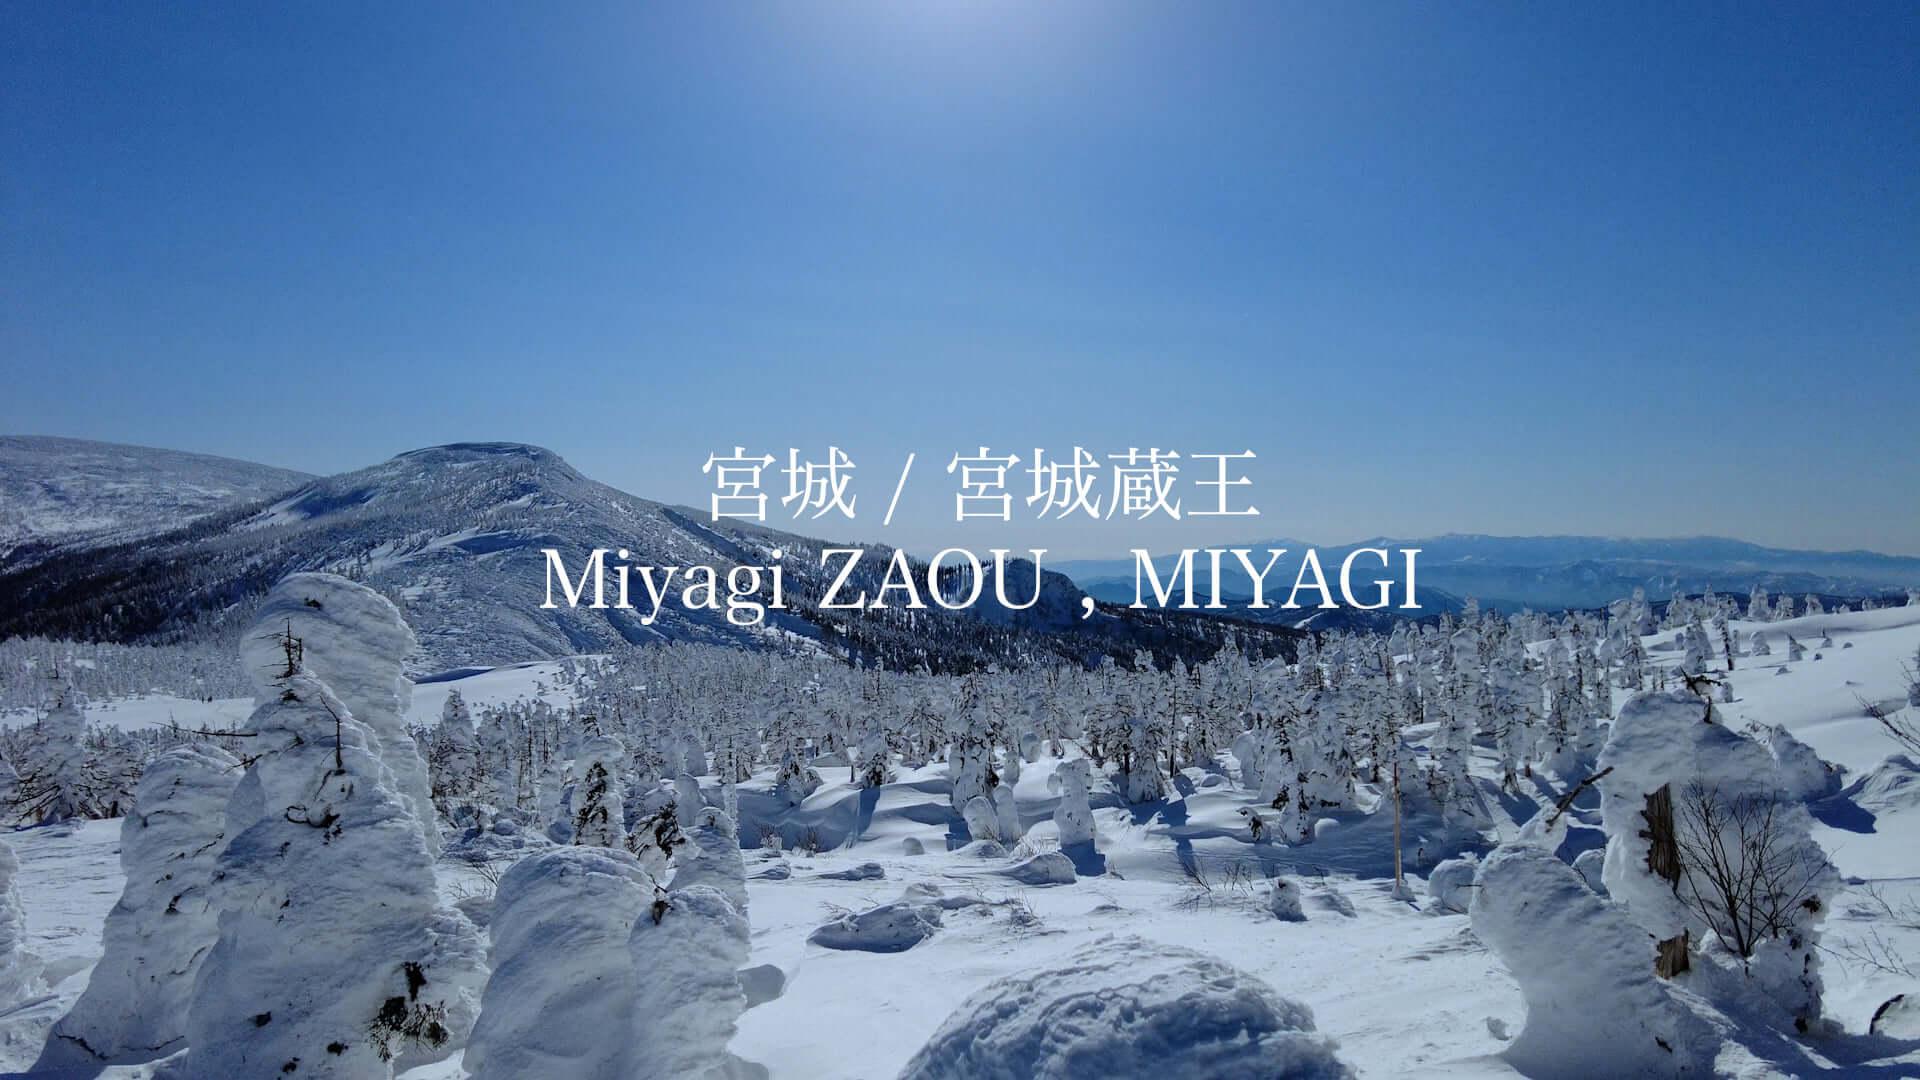 Kuniyuki Takahashiがマイナス6度の樹氷原で完全即興テクノライブを敢行!絶景音楽配信メディア「That Is Good」第7弾のショートPVが解禁 music210301_thatisgood_2-1920x1080